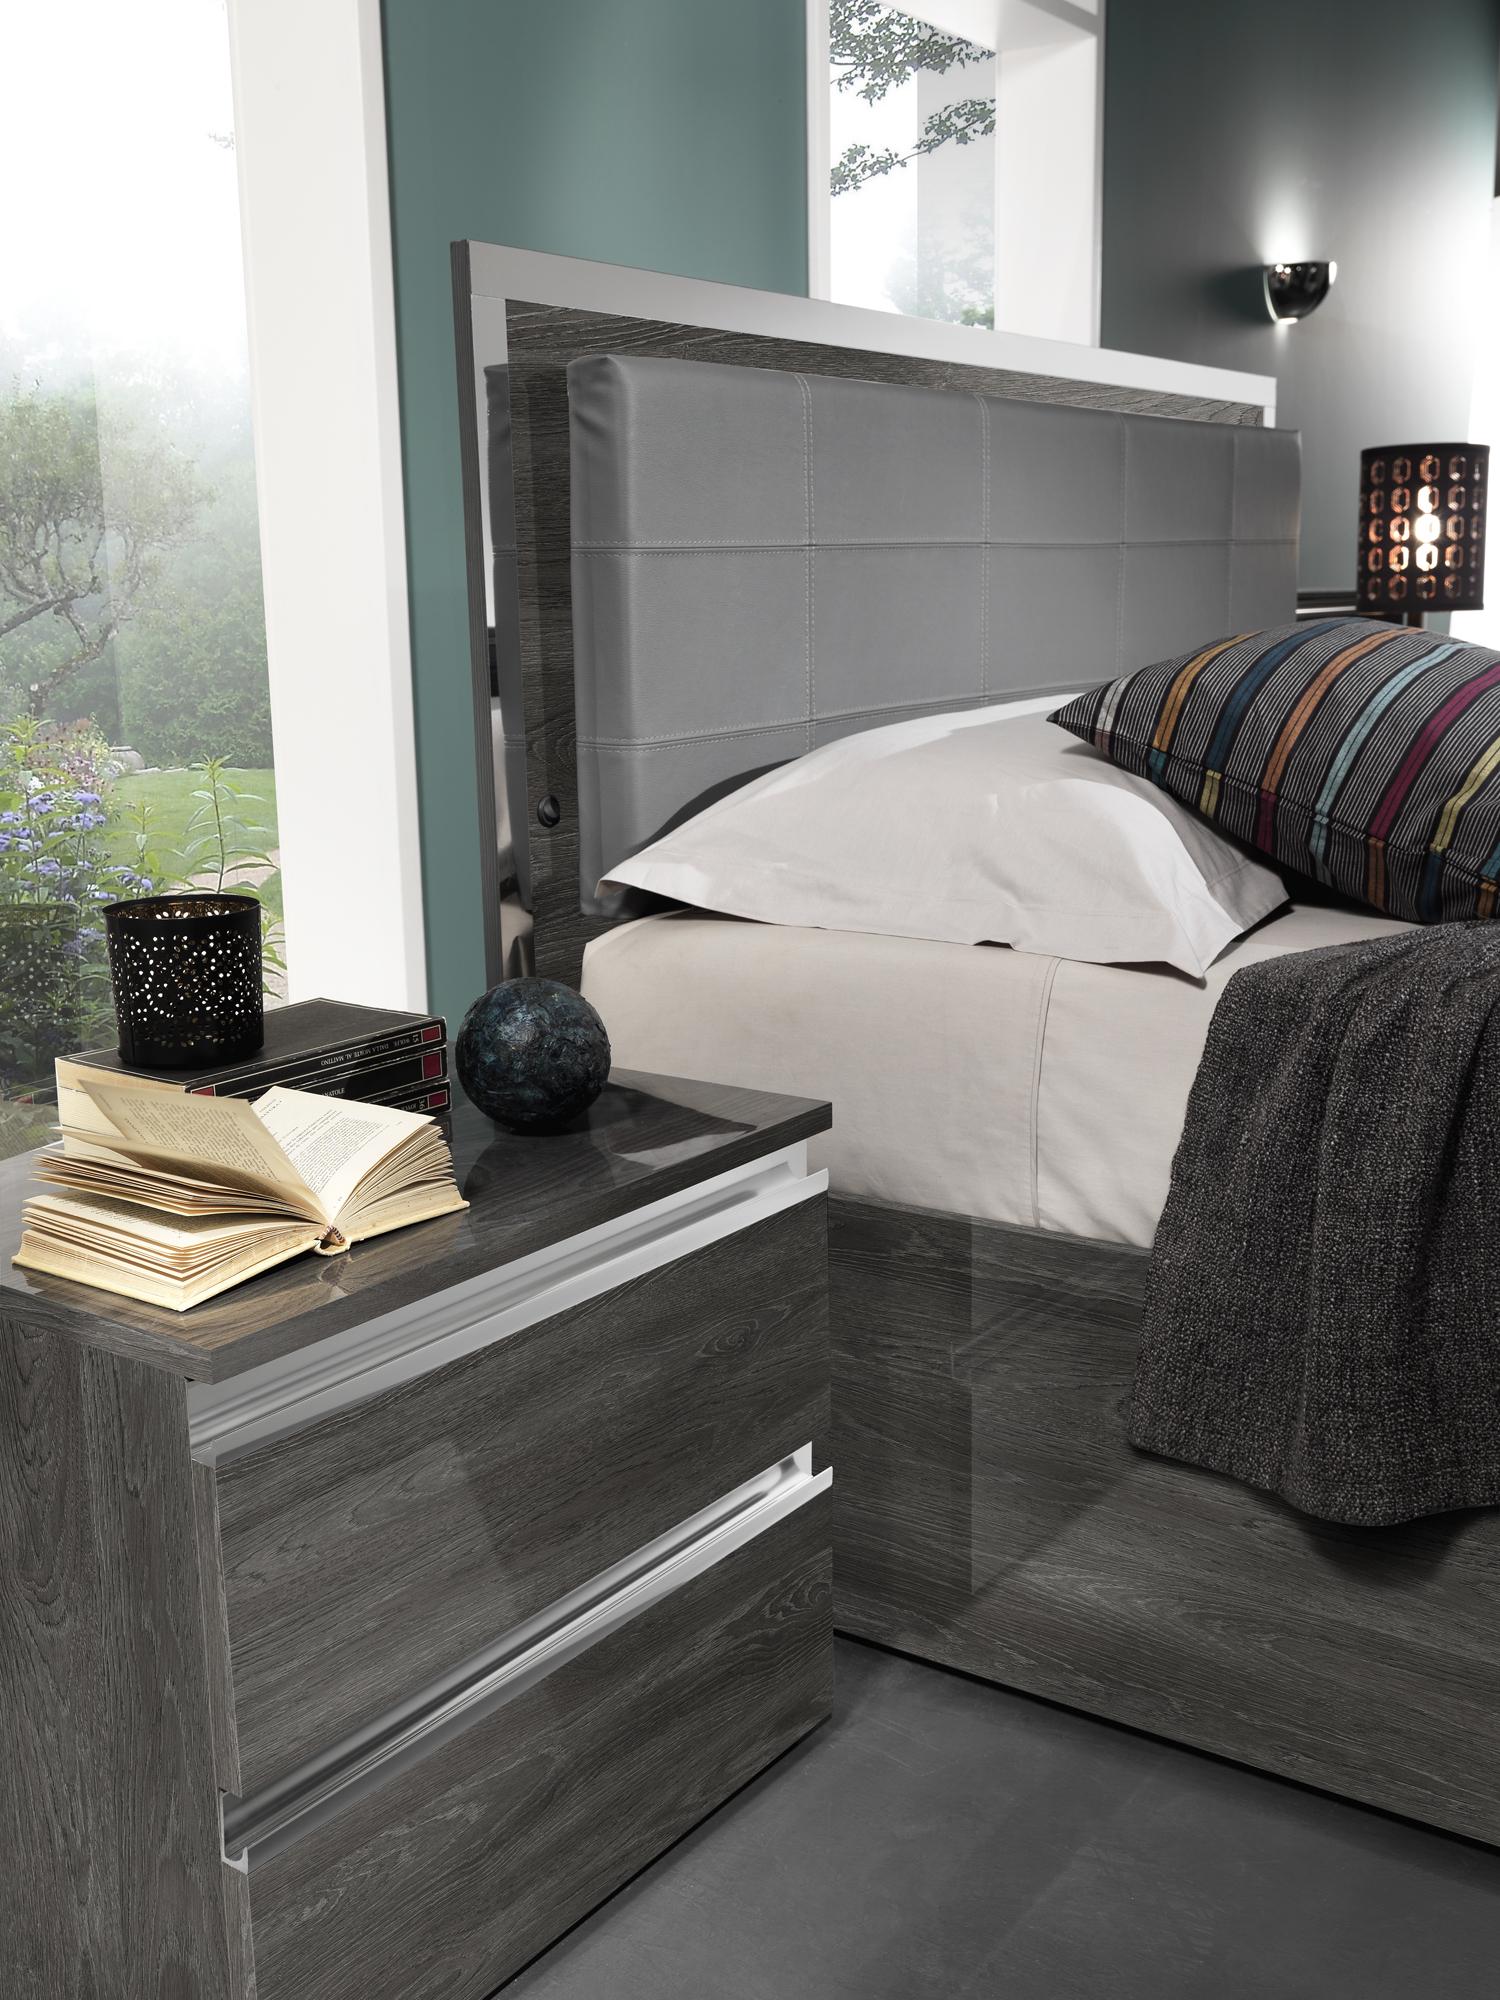 Modern Bedroom Sets From Spacify: Oxford Bedroom, Modern Bedrooms, Bedroom Furniture